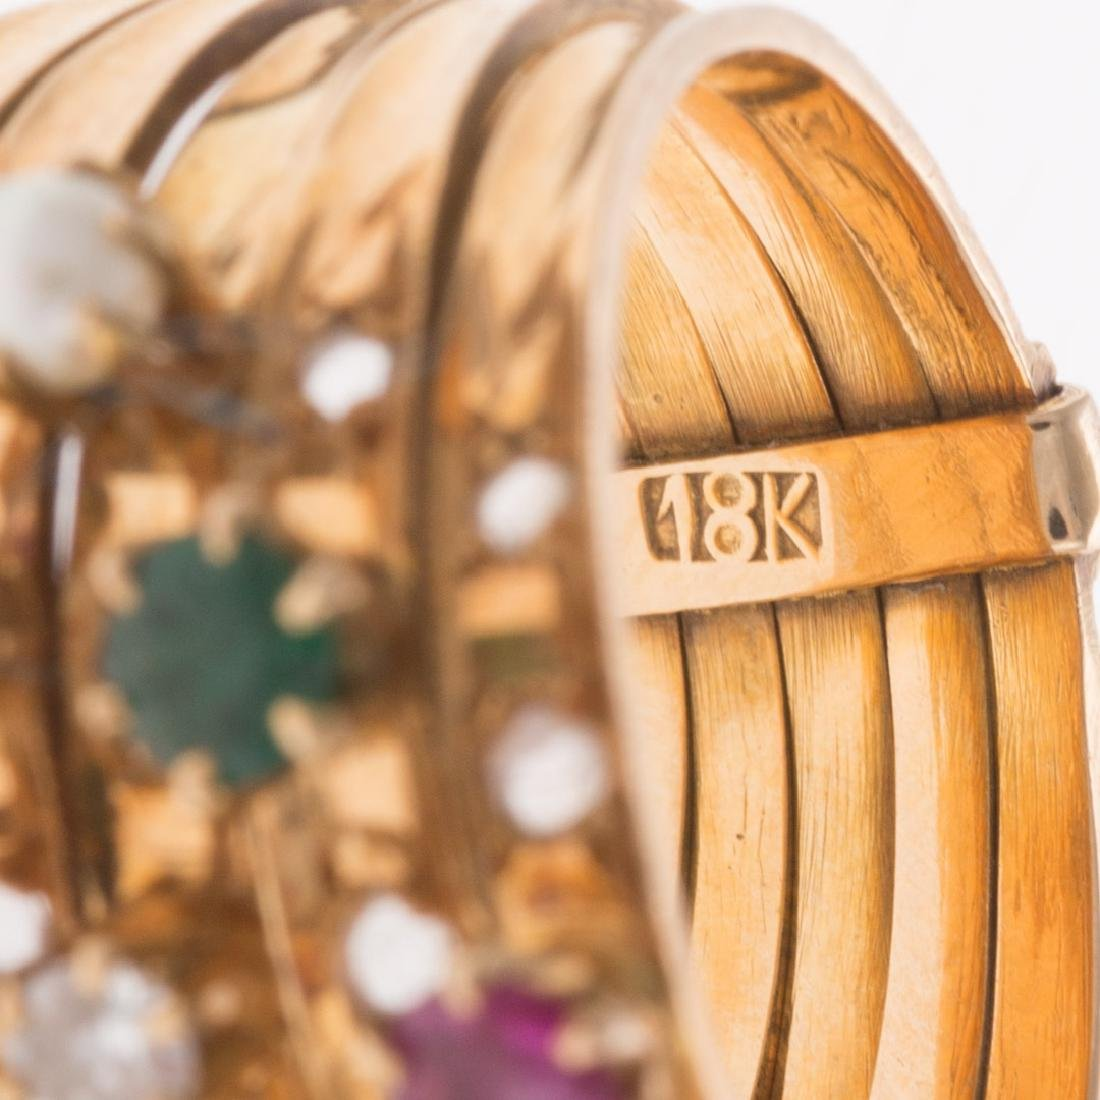 A Lady's 18K 5 Row Diamond & Gemstone Band - 5